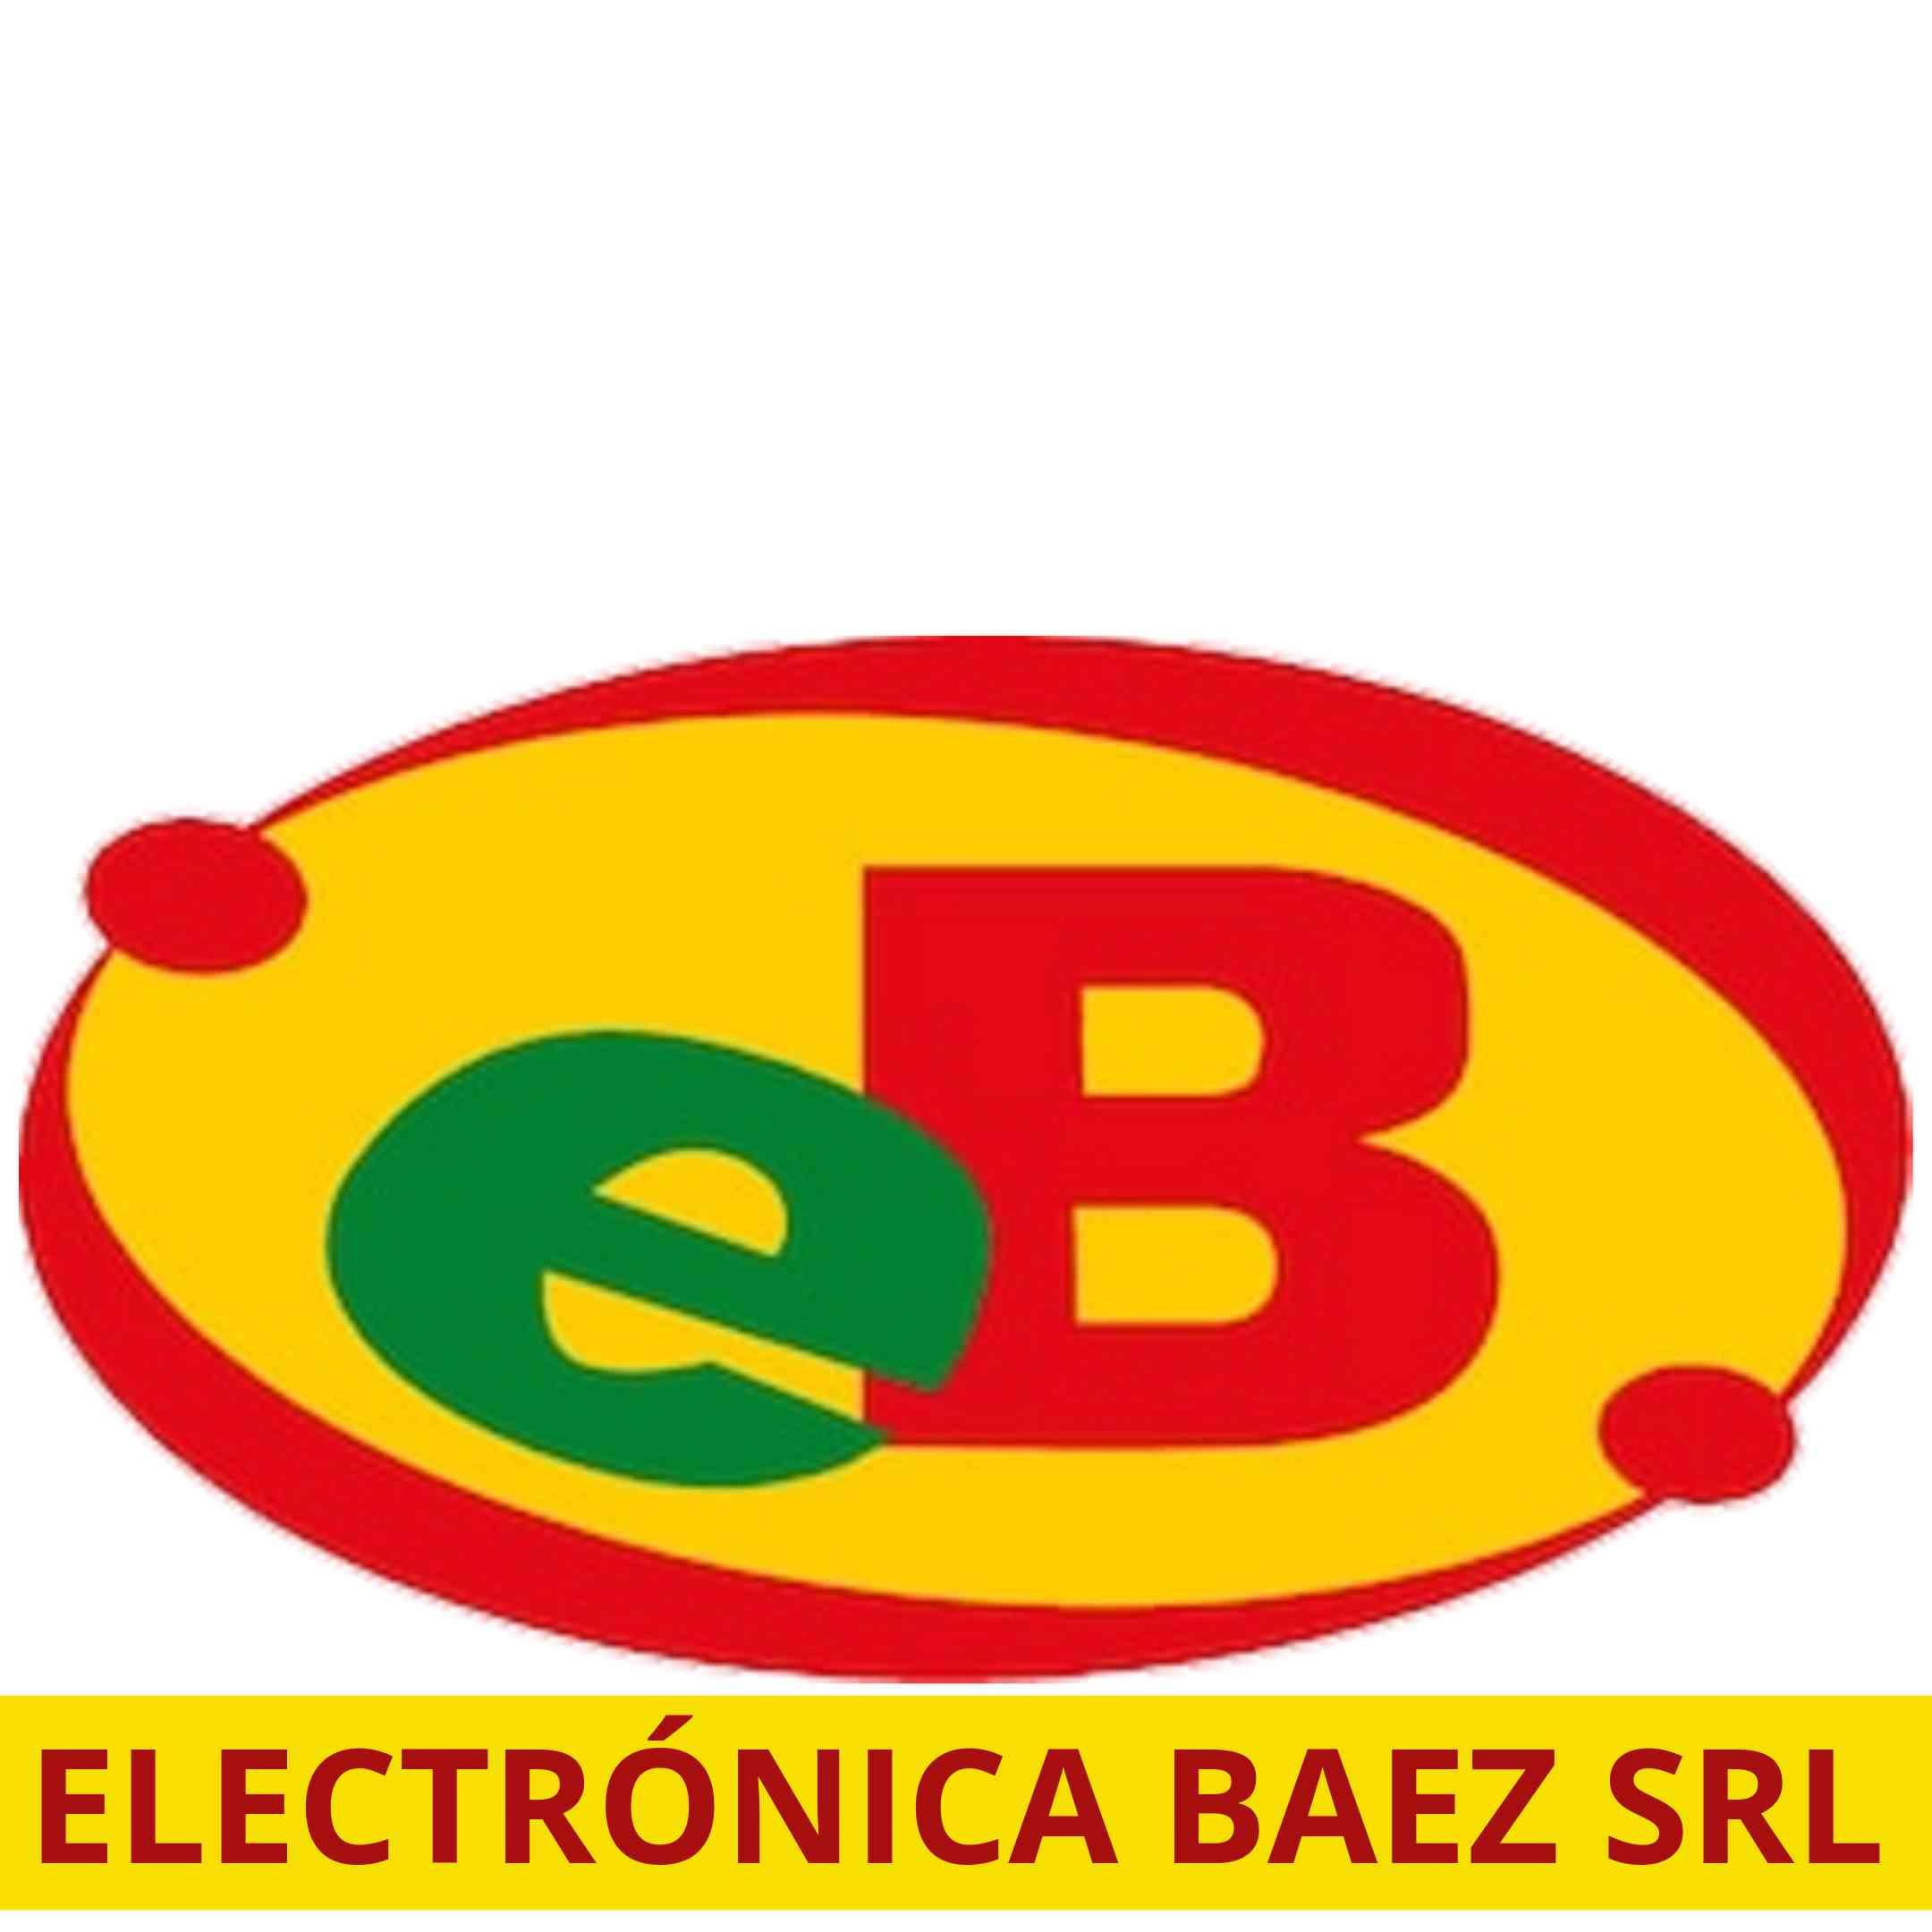 Electrónica Baez SRL